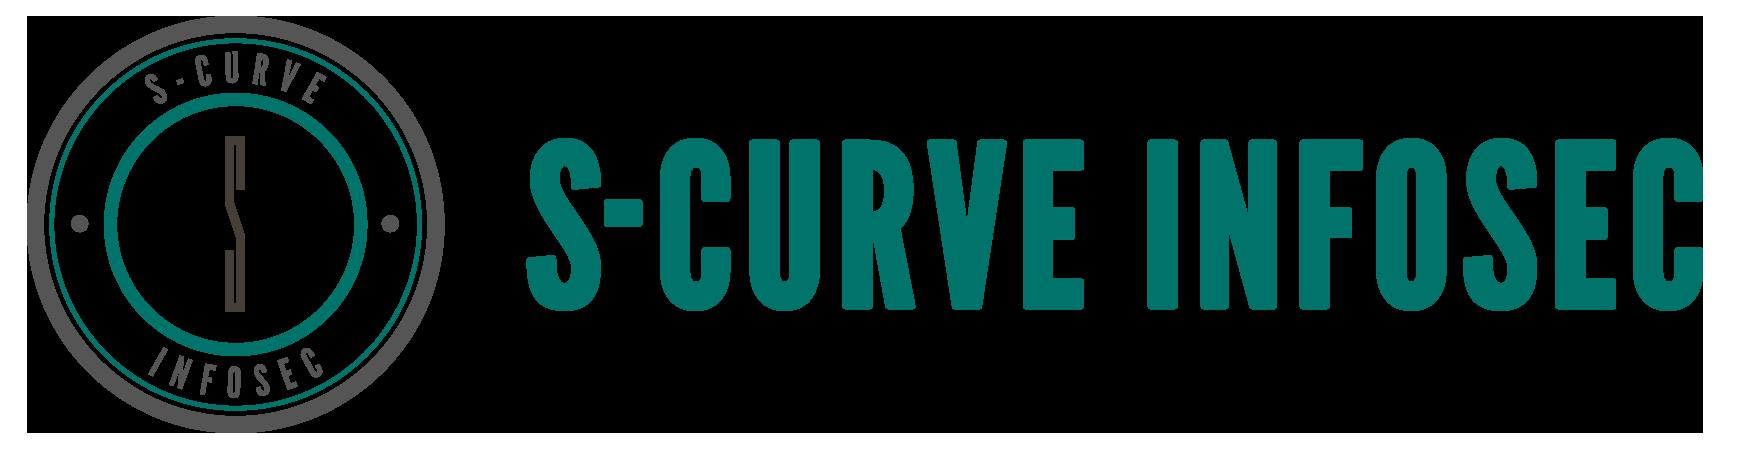 scurve-sitename-logo2a.png